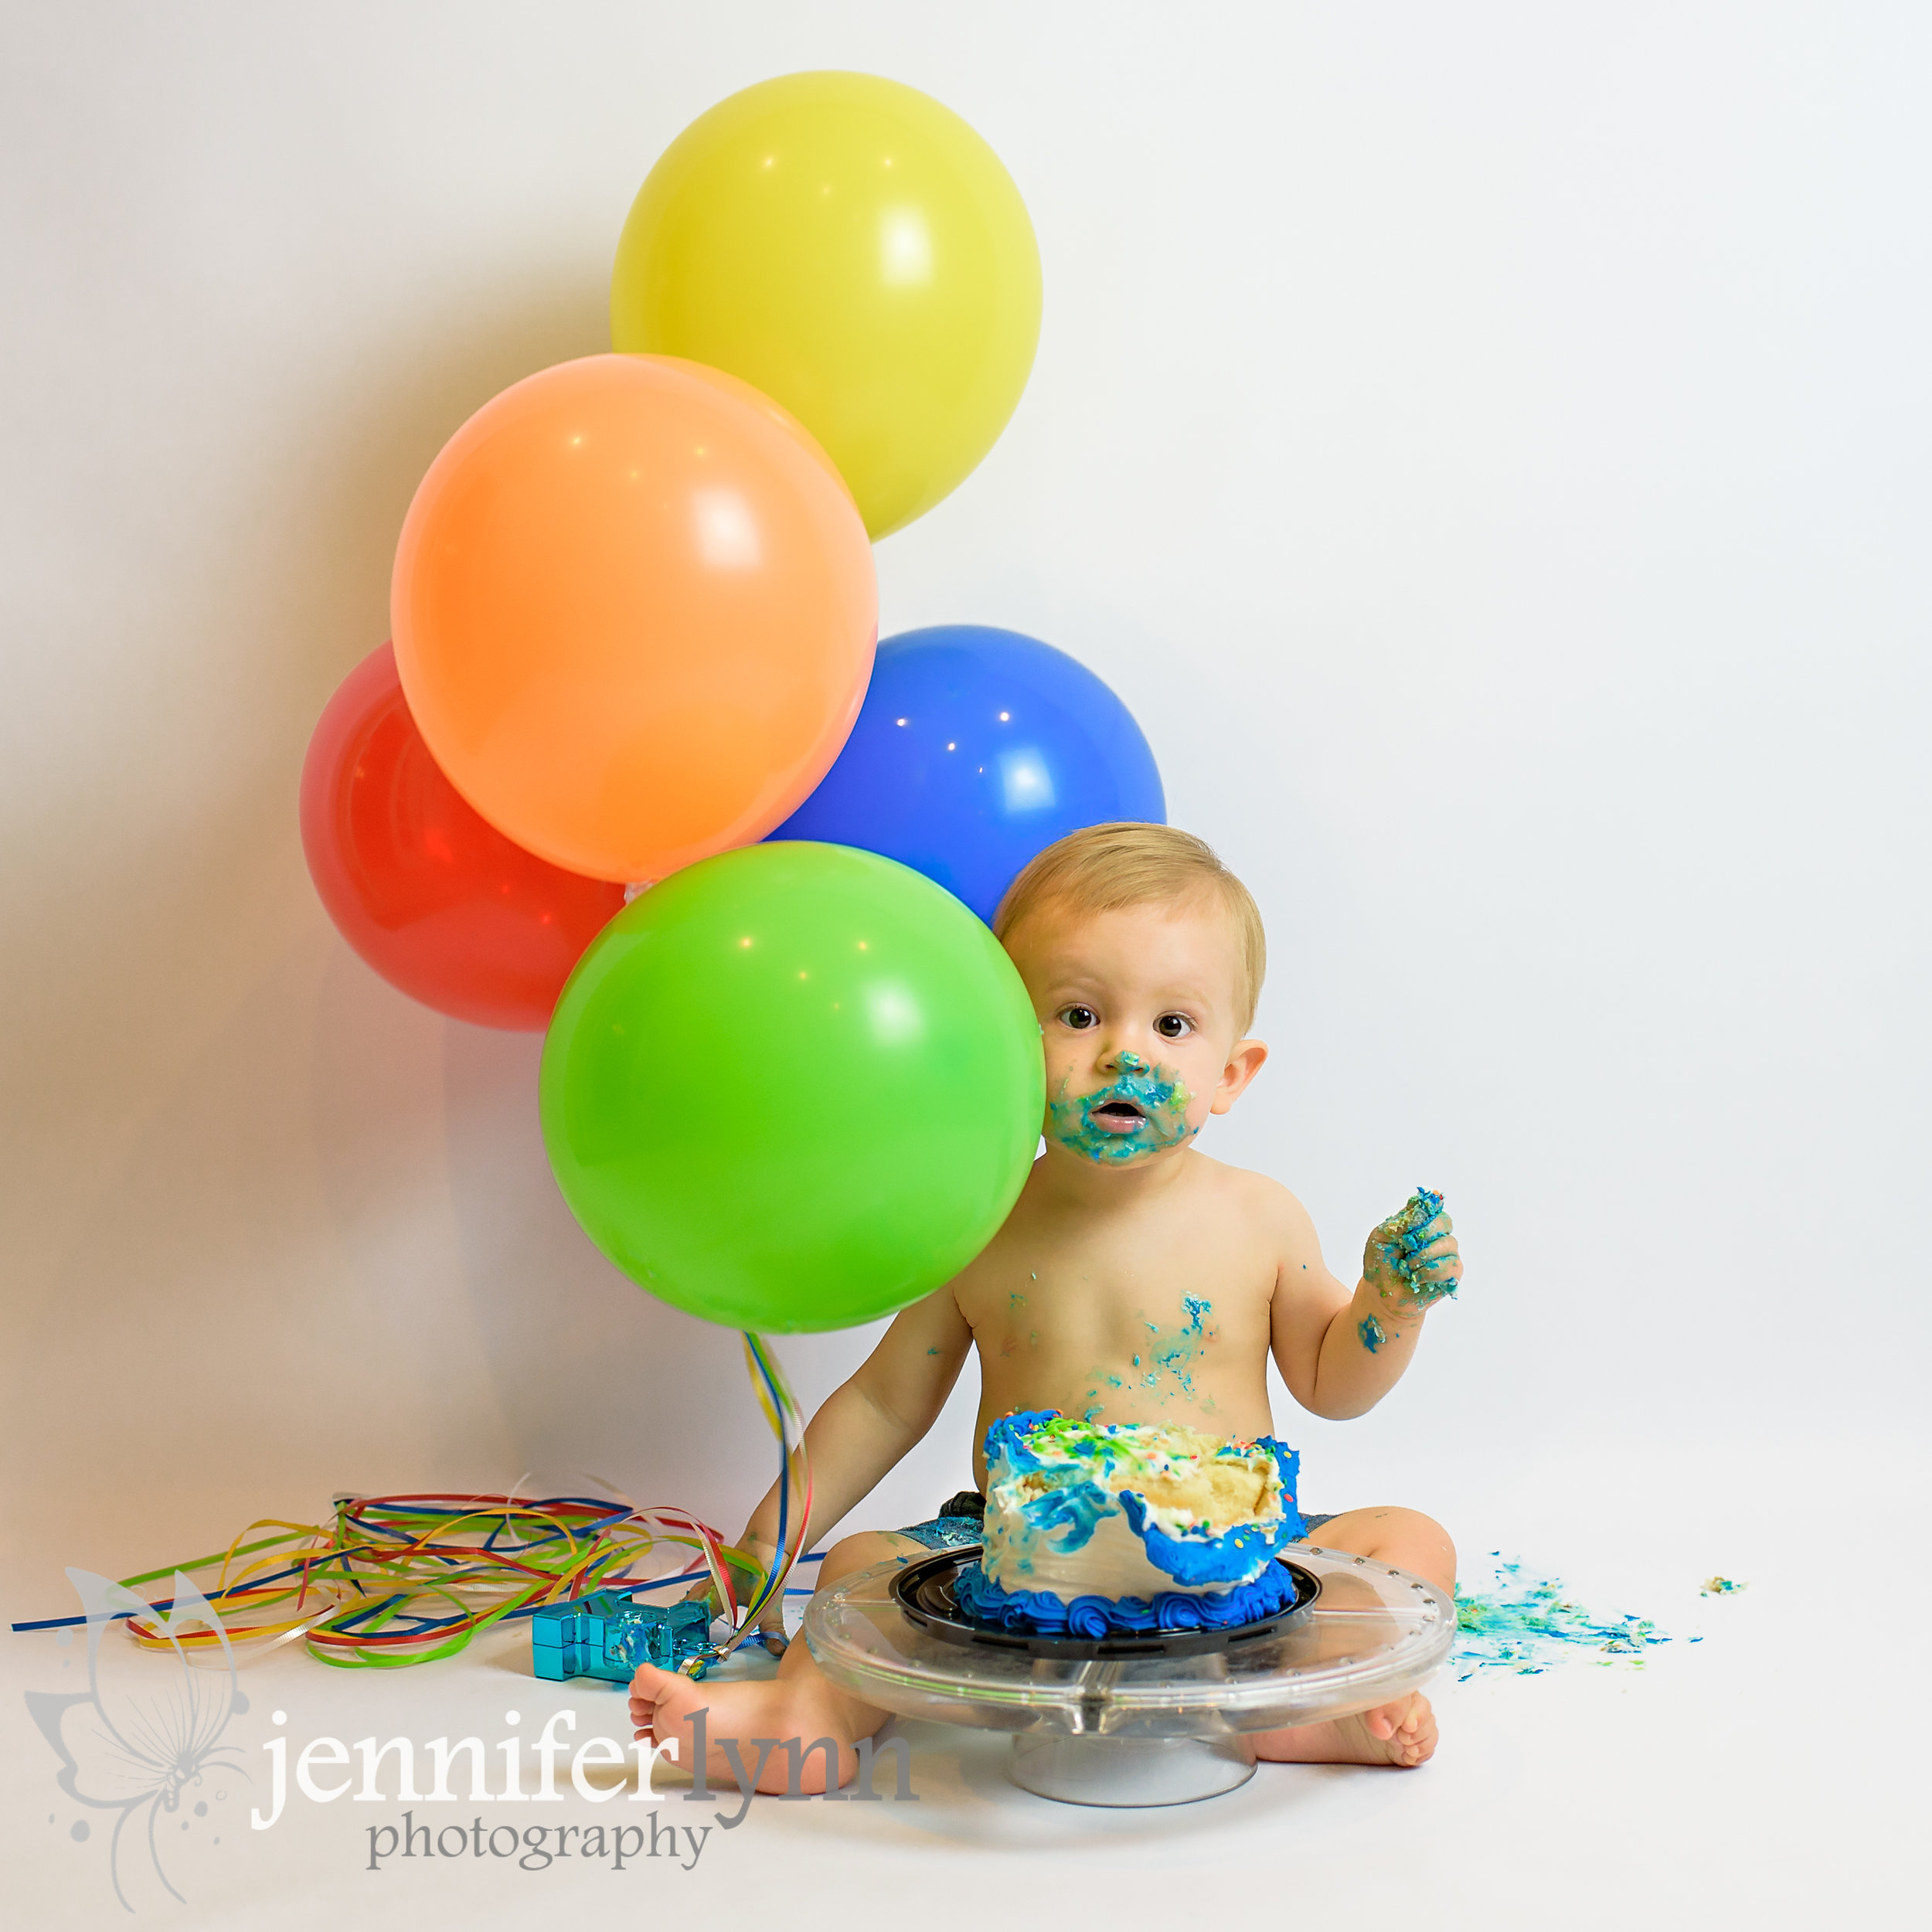 Baby-Cake-Smash-Milestone-Jennifer-Lynn-Photography